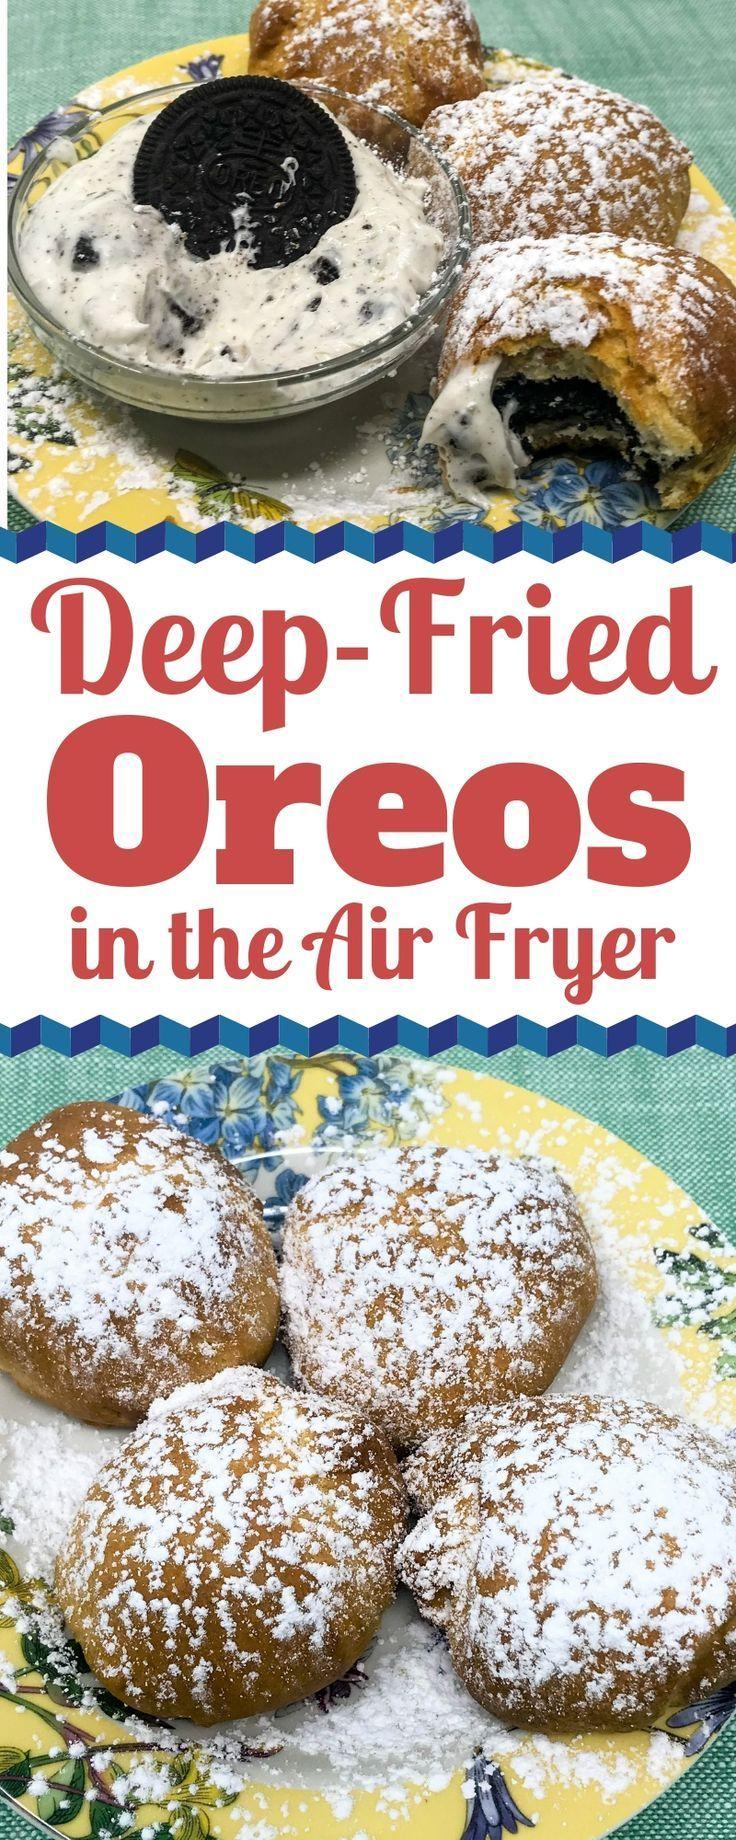 Air Fryer Oreos with Oreo Dip Recipe Air fryer recipes